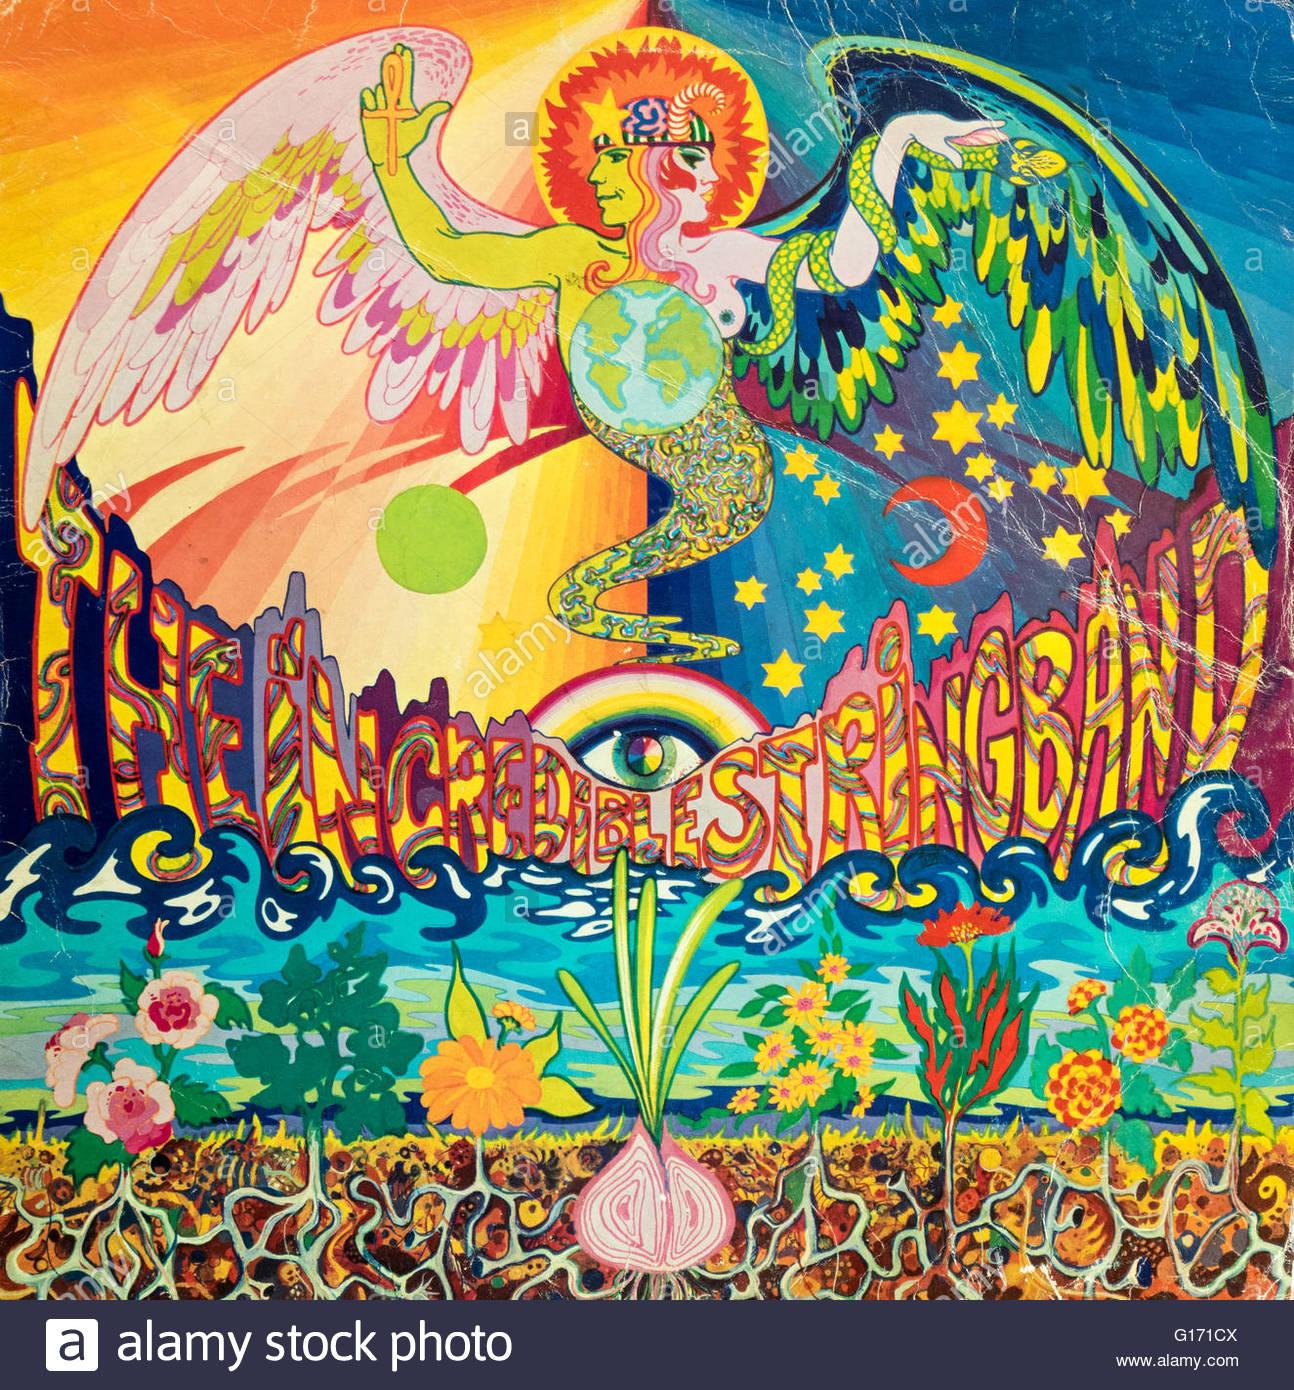 Iconic Used Album Cover From 1967 Folk Amp Folk Rock Vinyl